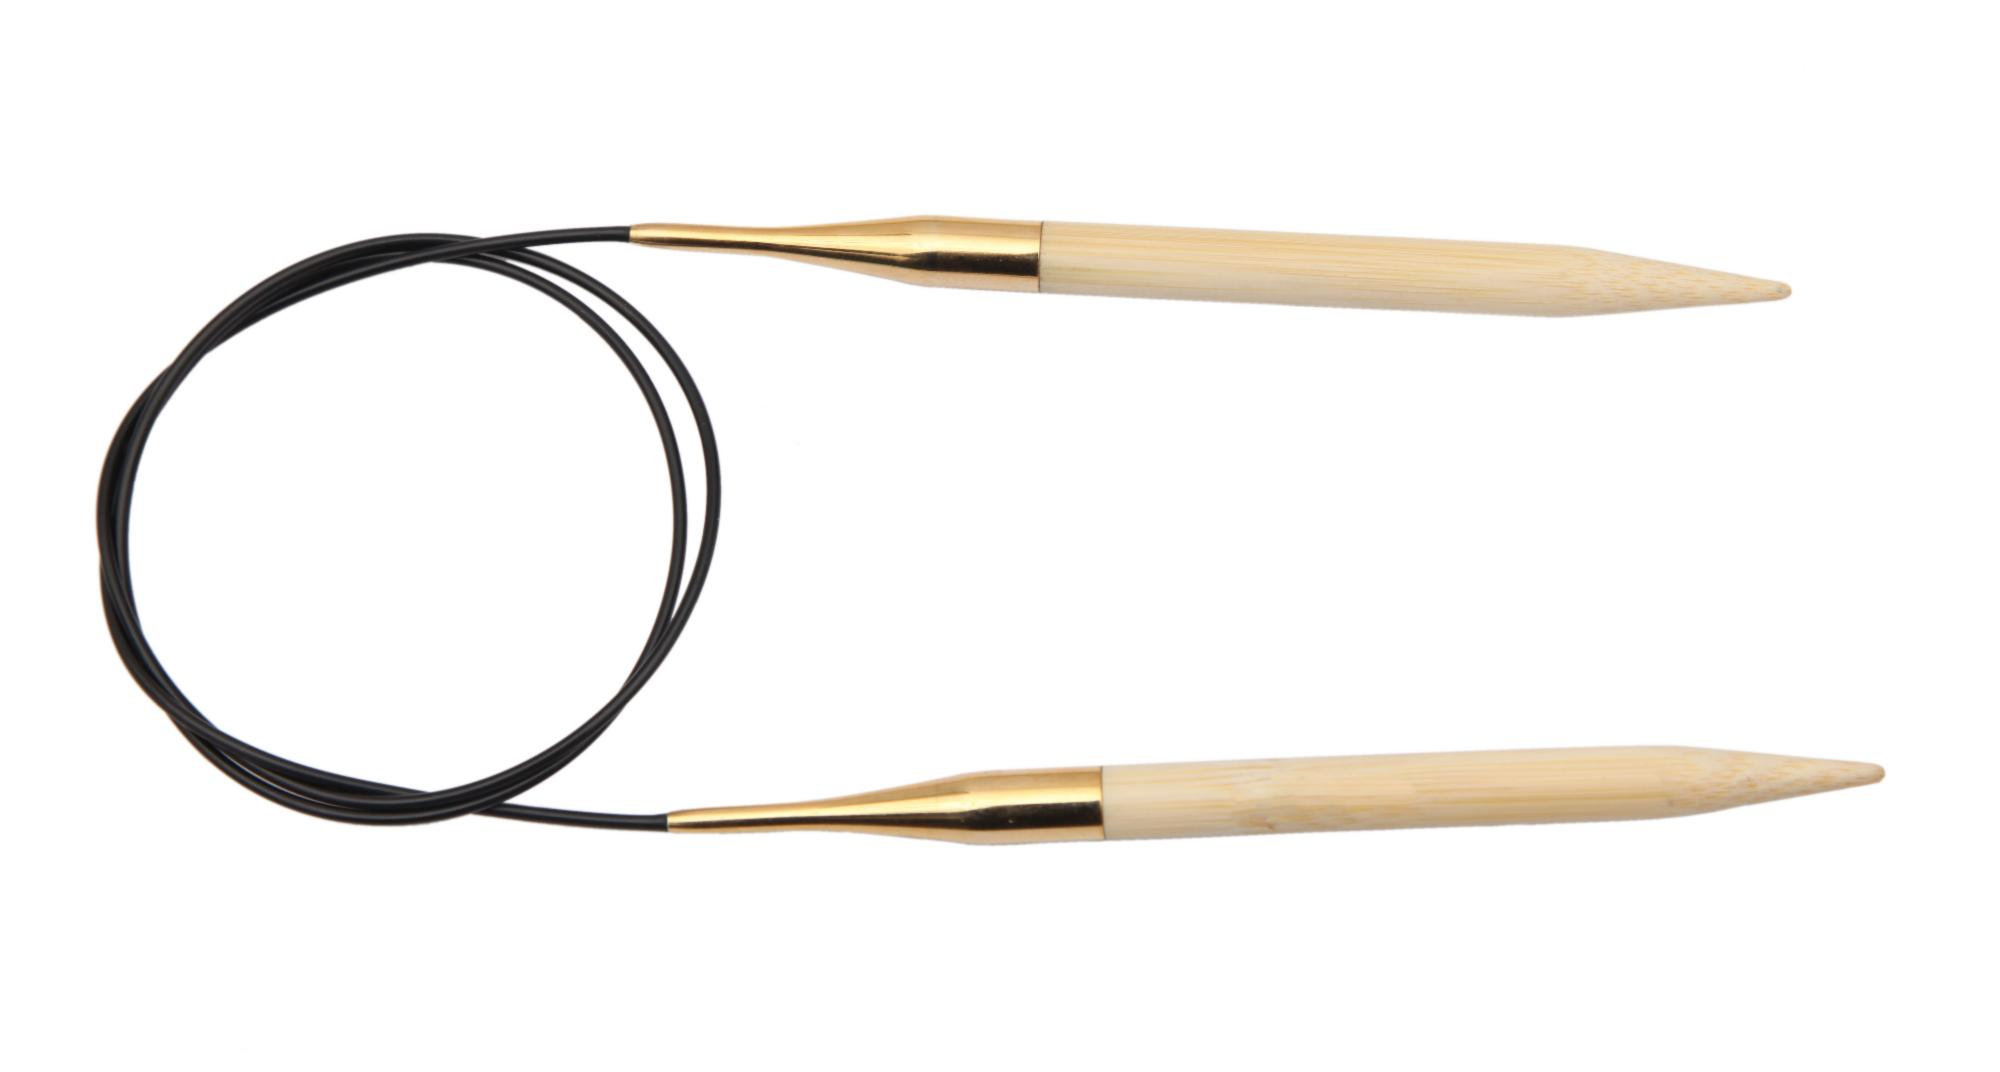 Спицы круговые 100 см Bamboo KnitPro, 22275, 9.00 мм